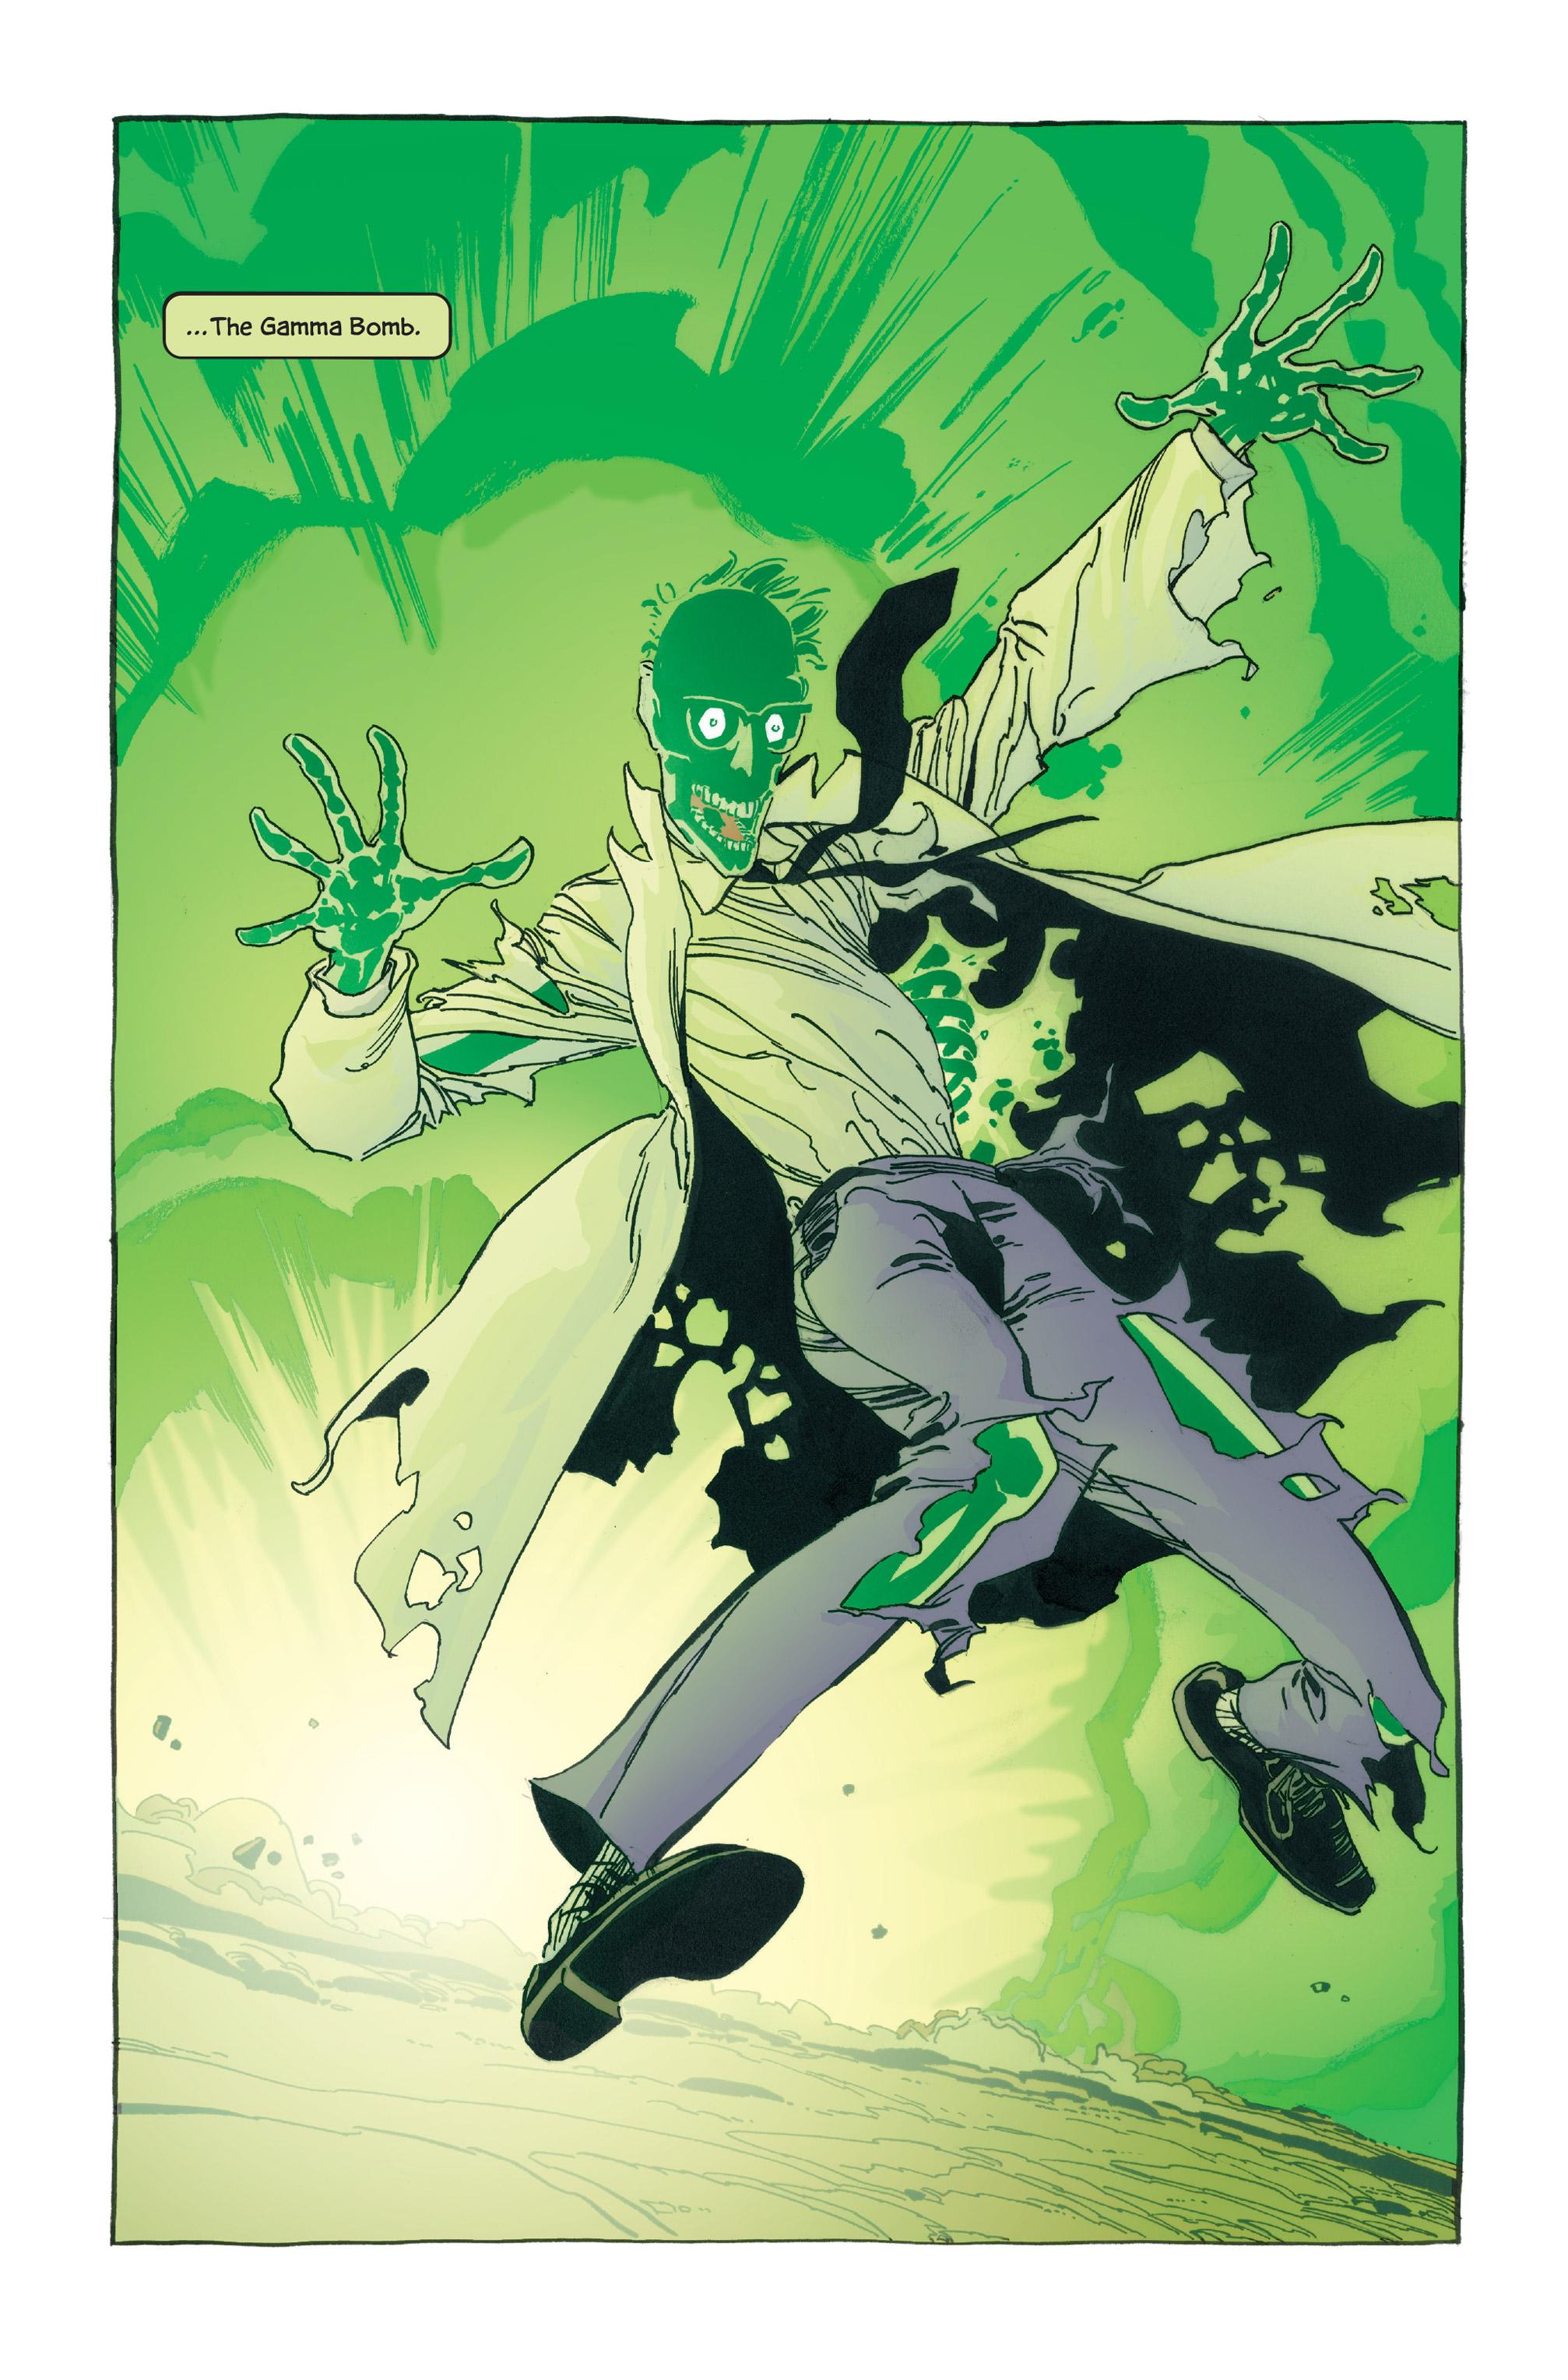 Read online Hulk: Gray comic -  Issue #1 - 7